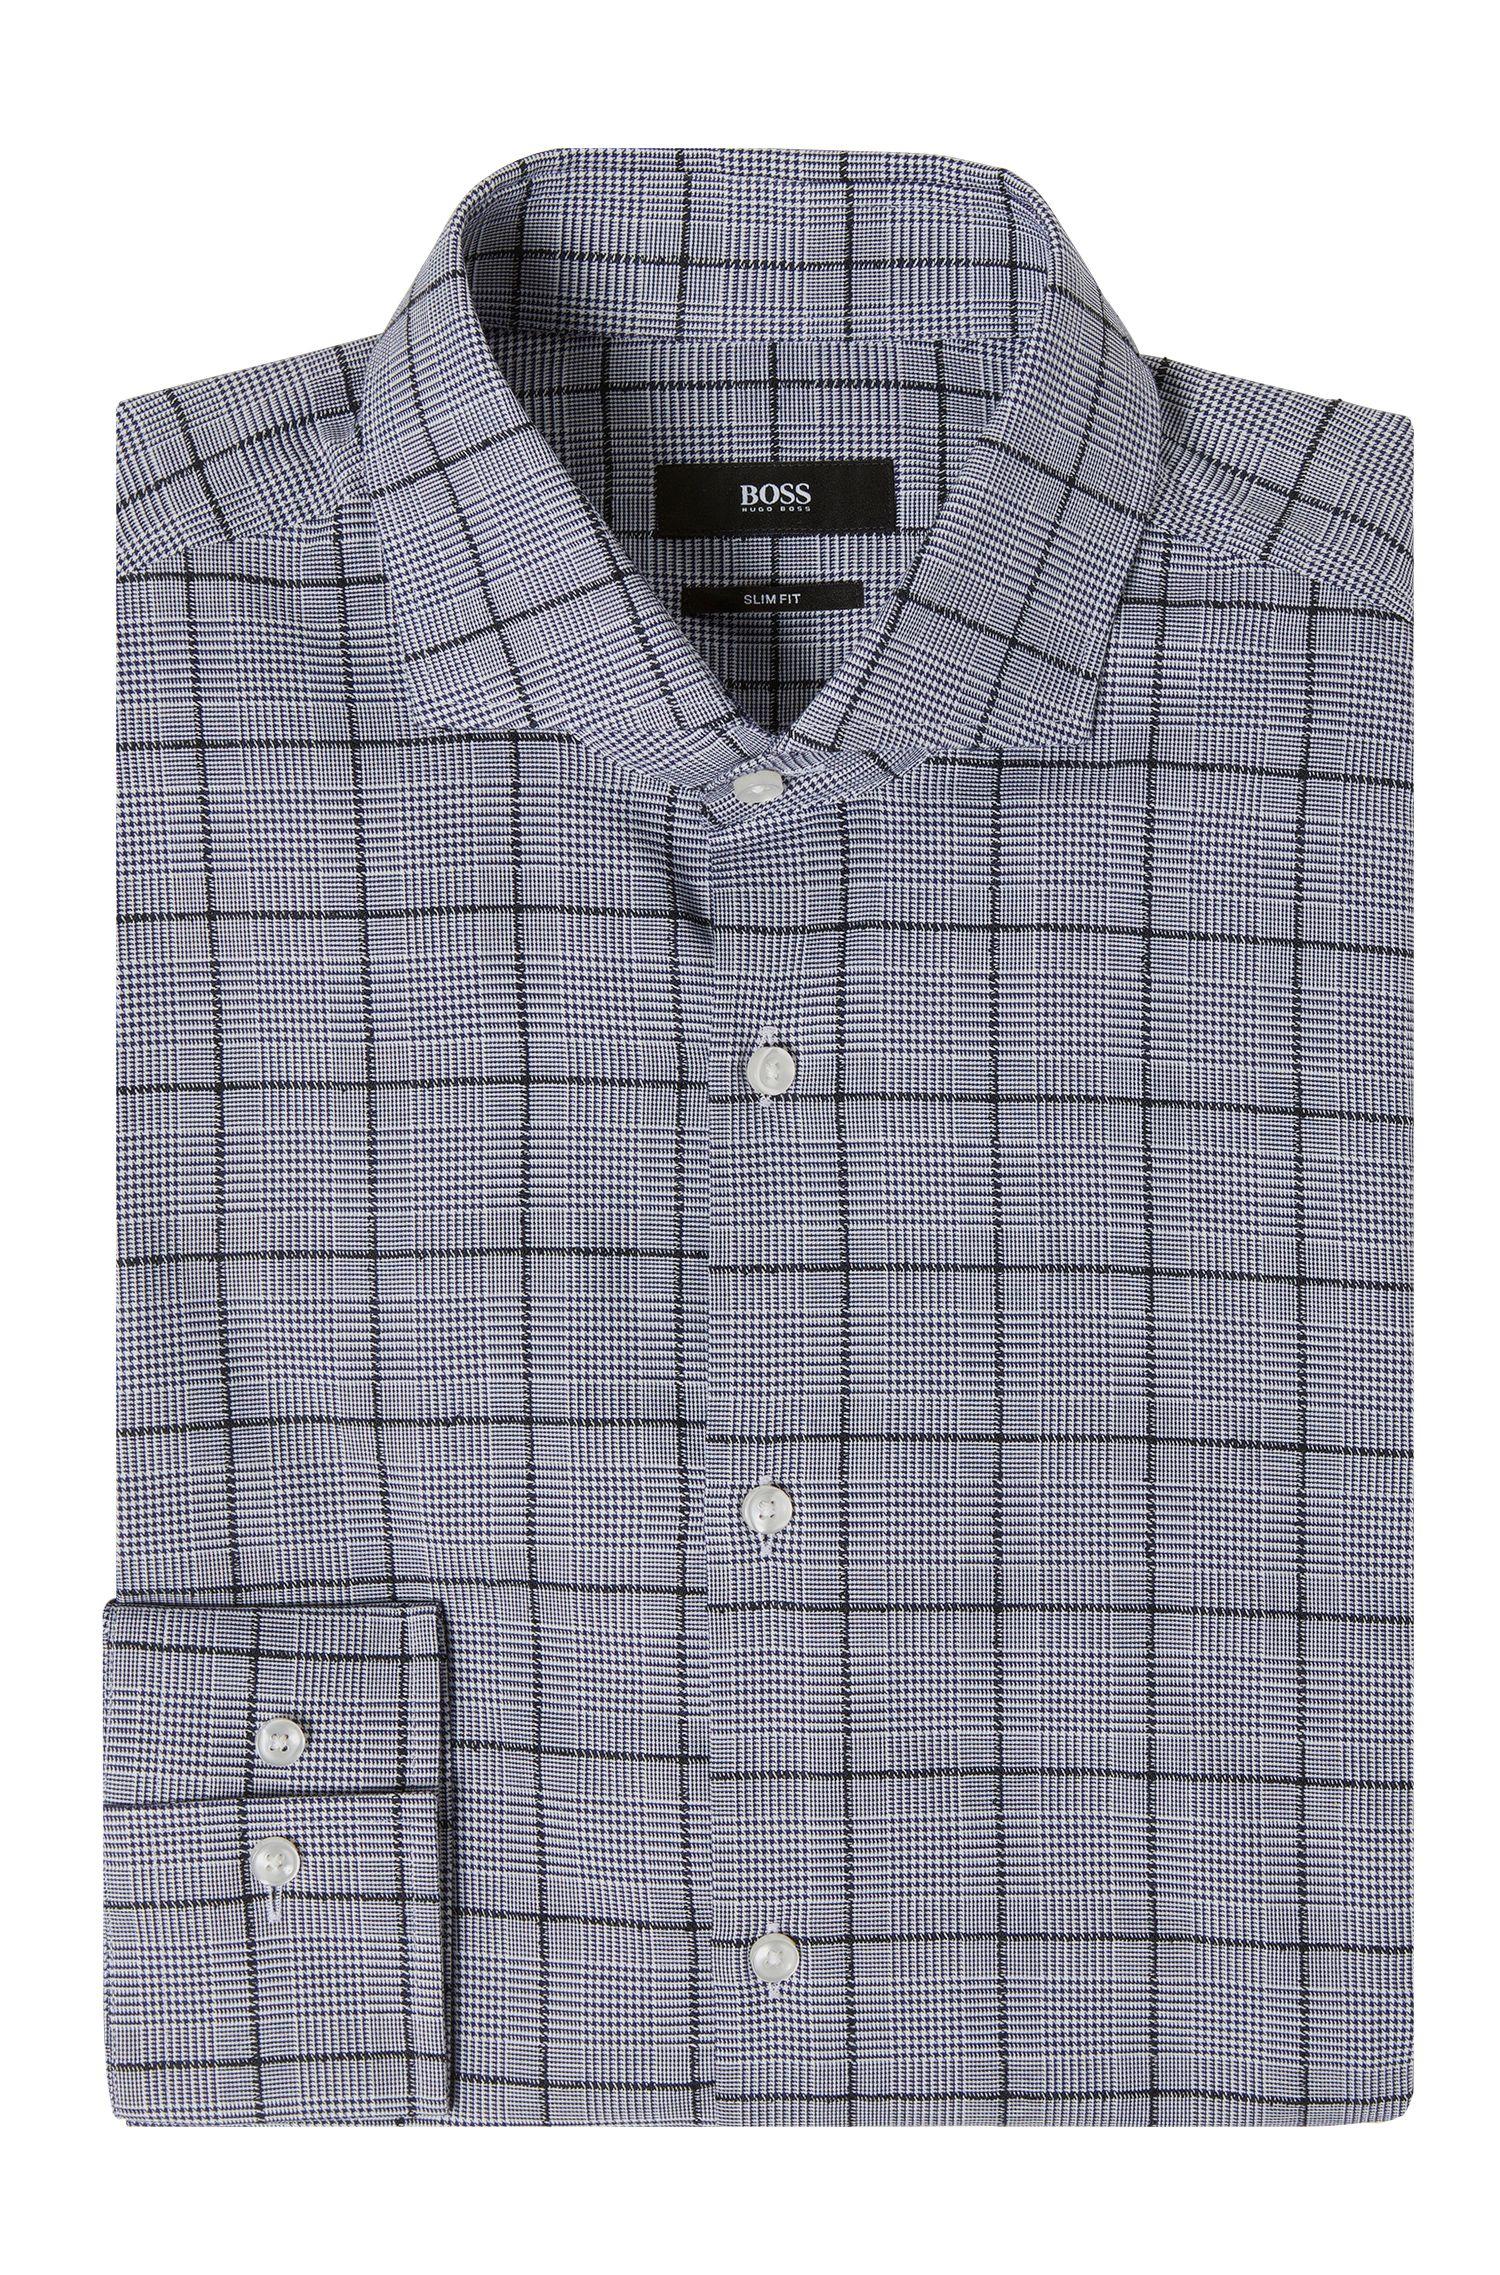 'Jason' | Slim Fit, Italian Cotton Blend Patterned Dress Shirt